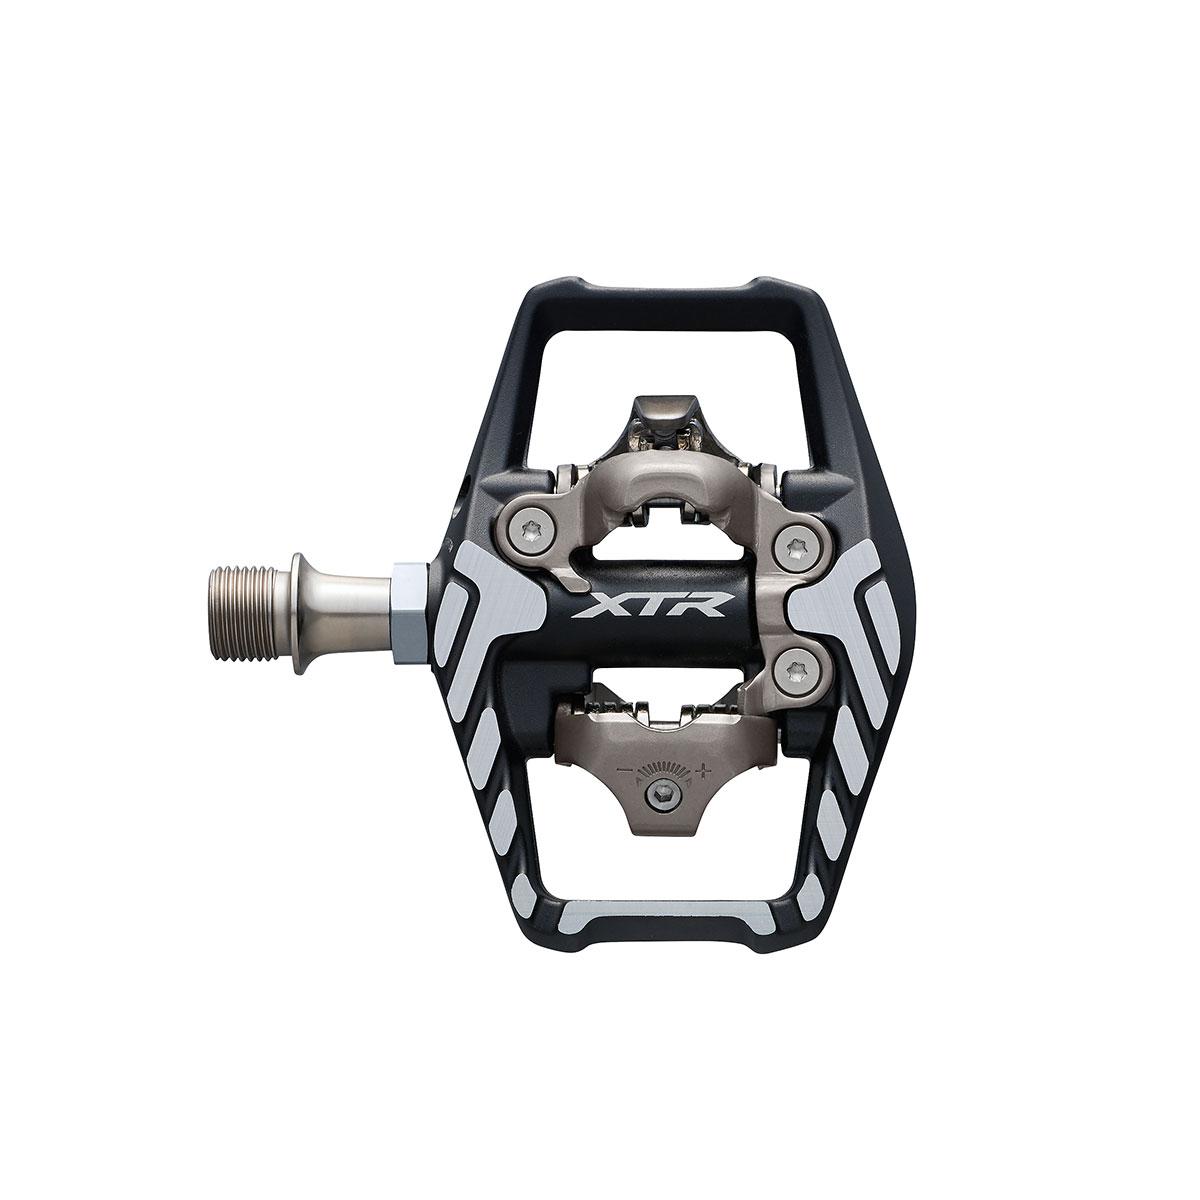 פדלים Shimano (9120) XTR SPD Pedal W/ Reflector W/ Cleat SMSH51